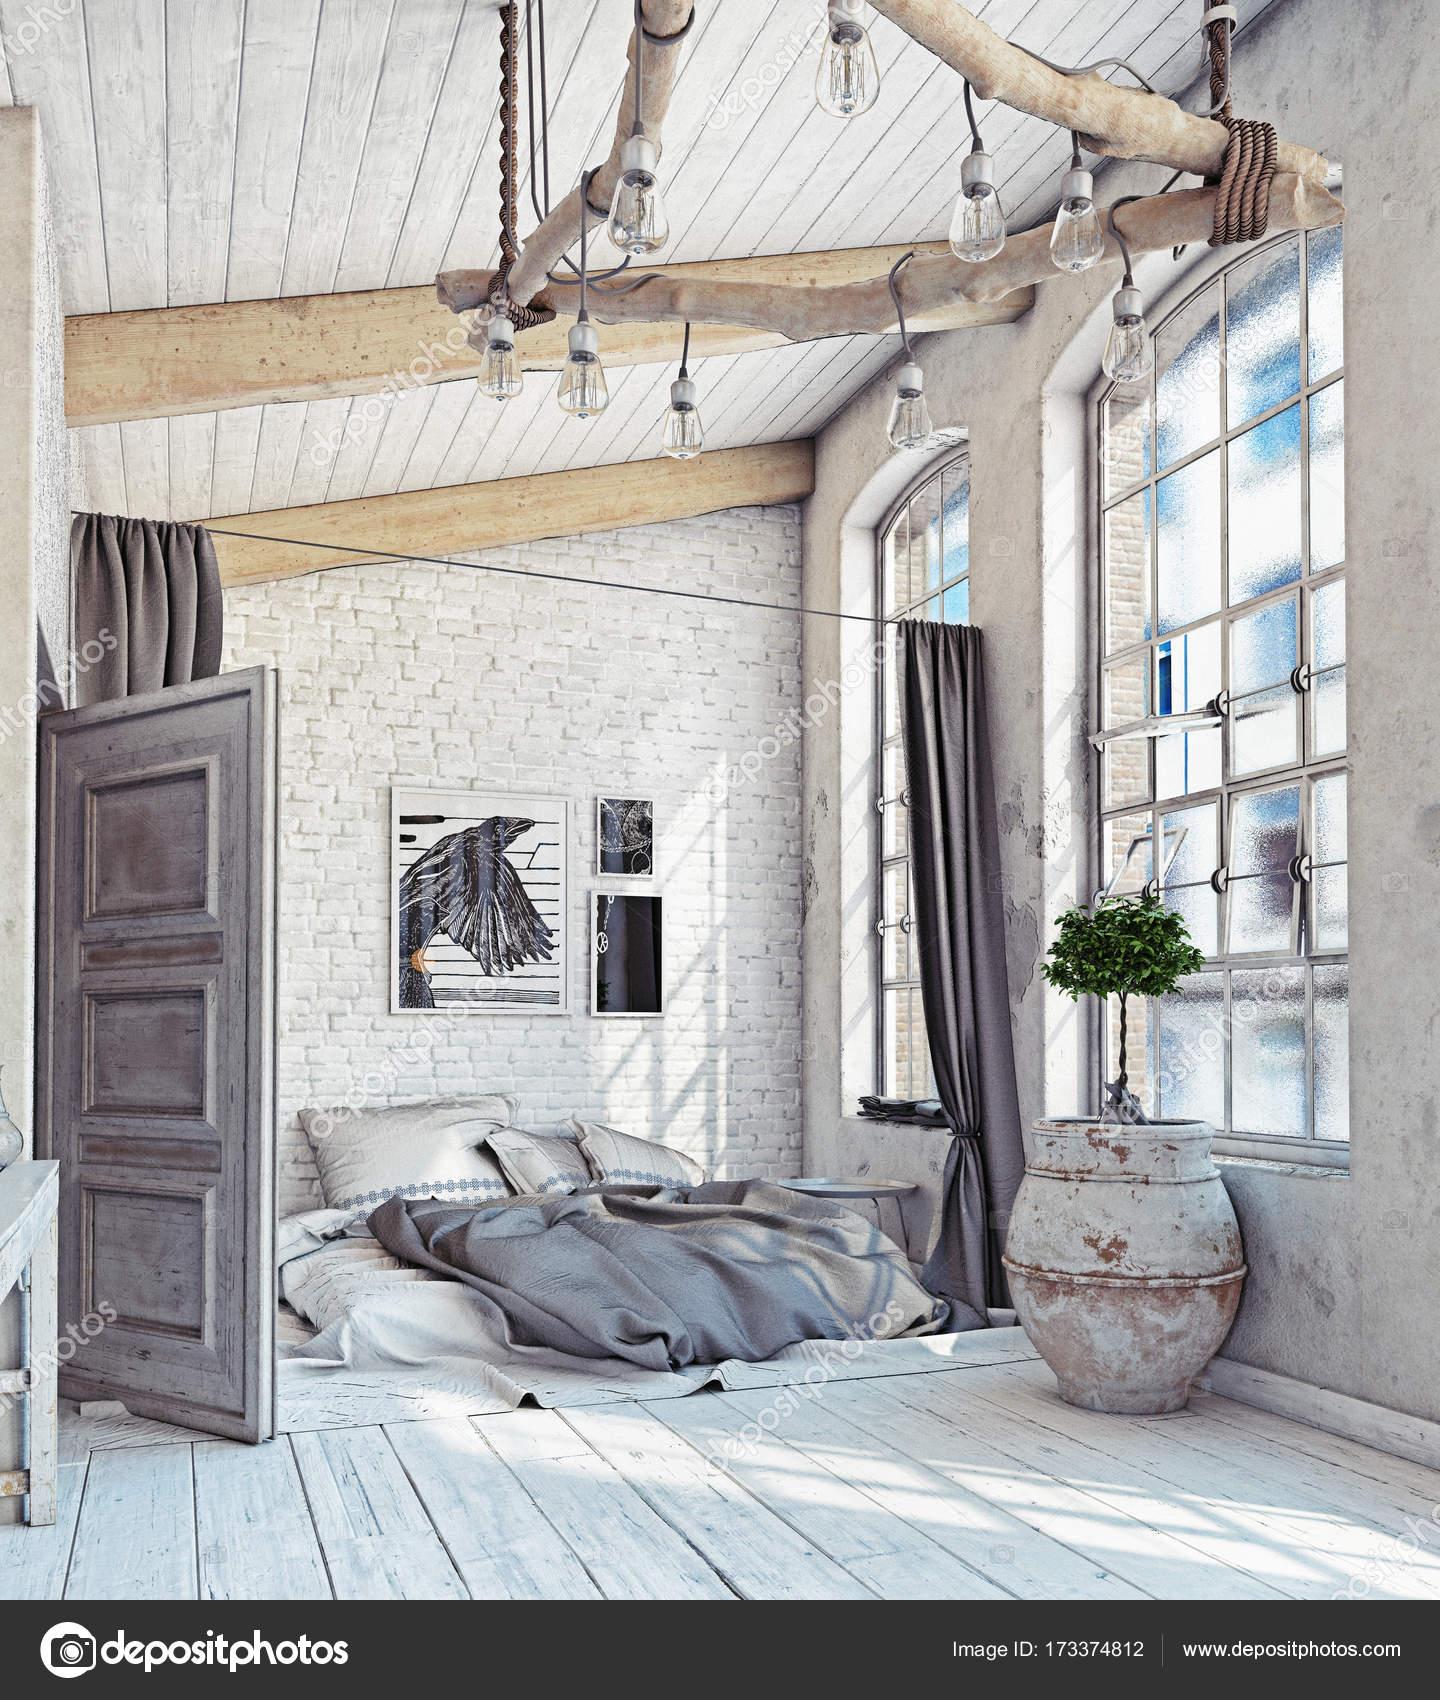 https://st3.depositphotos.com/1009647/17337/i/1600/depositphotos_173374812-stockafbeelding-scandinavische-slaapkamer-interieur.jpg